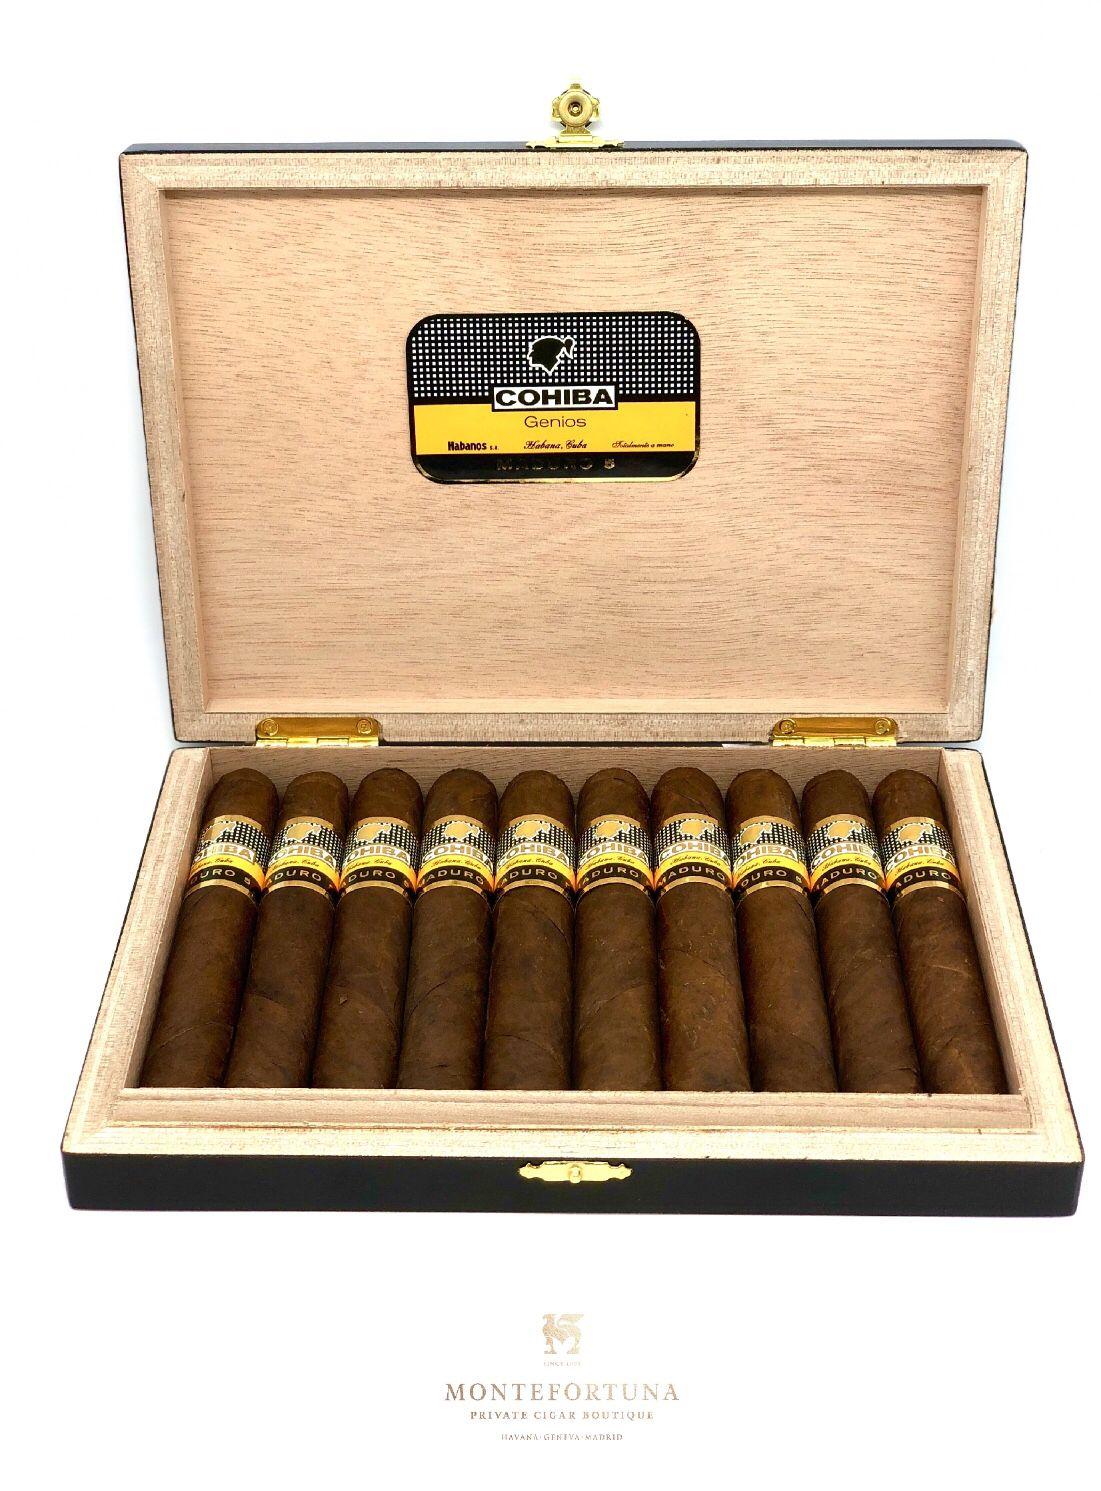 cohiba maduro genios puros cigars, cuban cigars, buy cigars onlineavailable at montefortuna cigars cigars for sale, buy cigars online, cigar shops, cuban